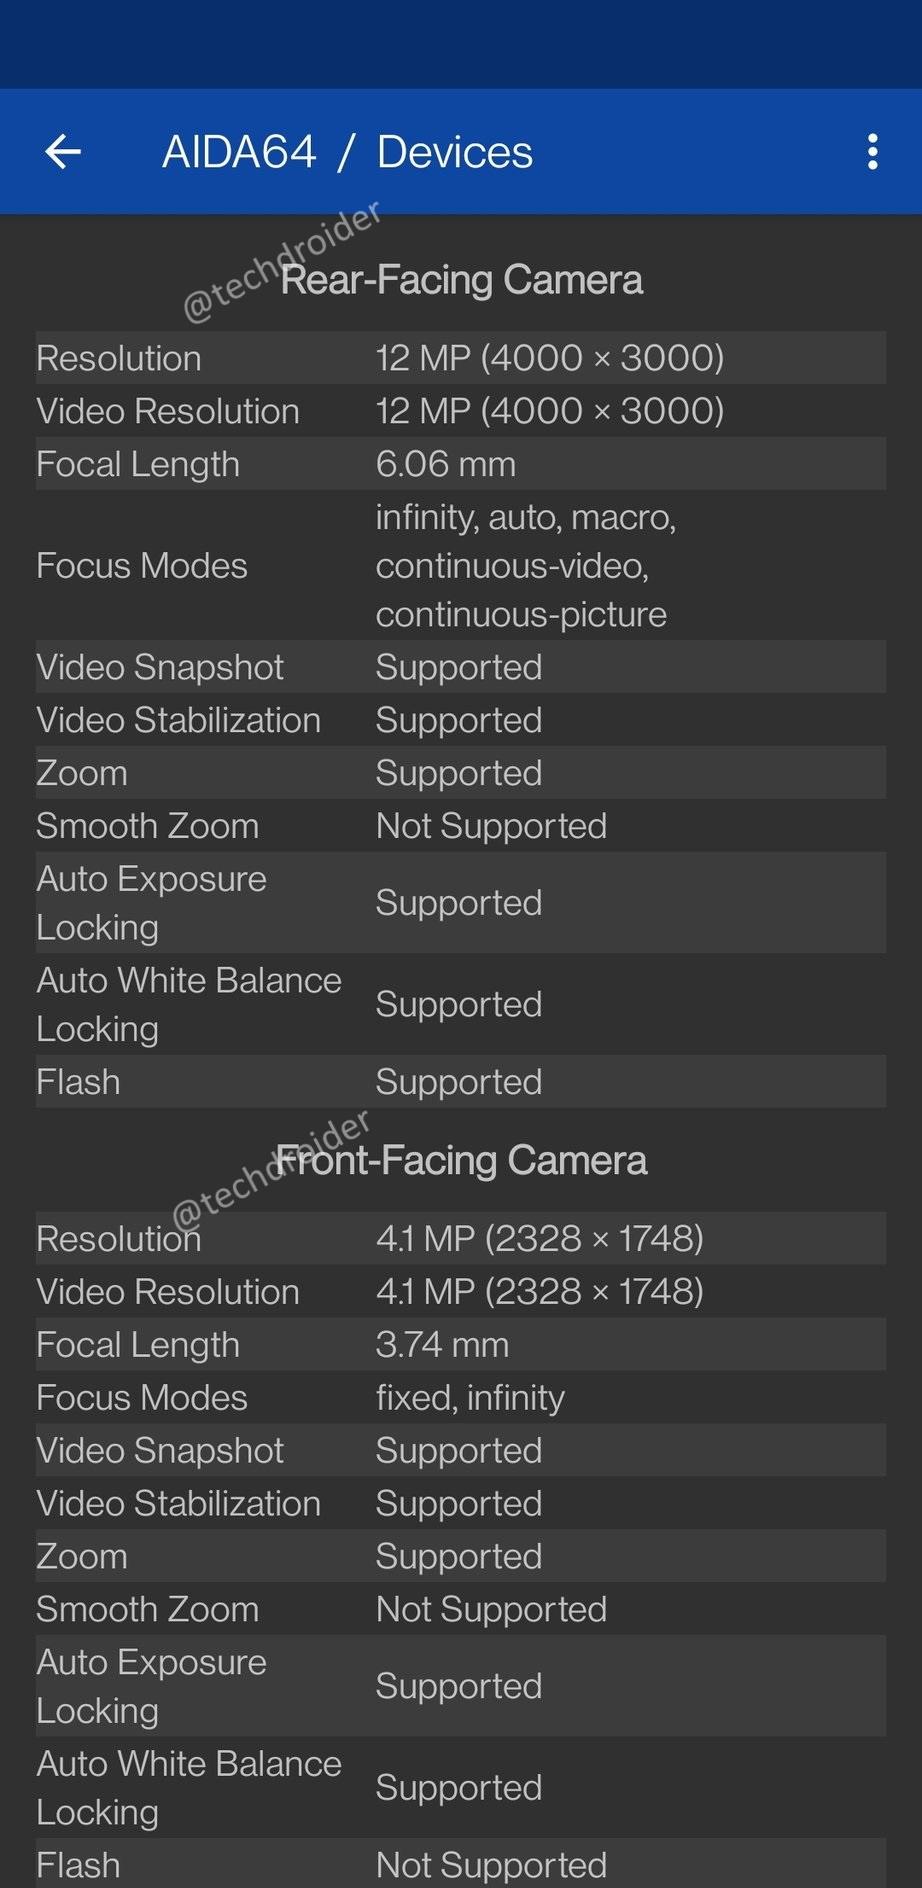 EukT KlVEAAaq37 AIDA64, mobile, oneplus, OnePlus 9